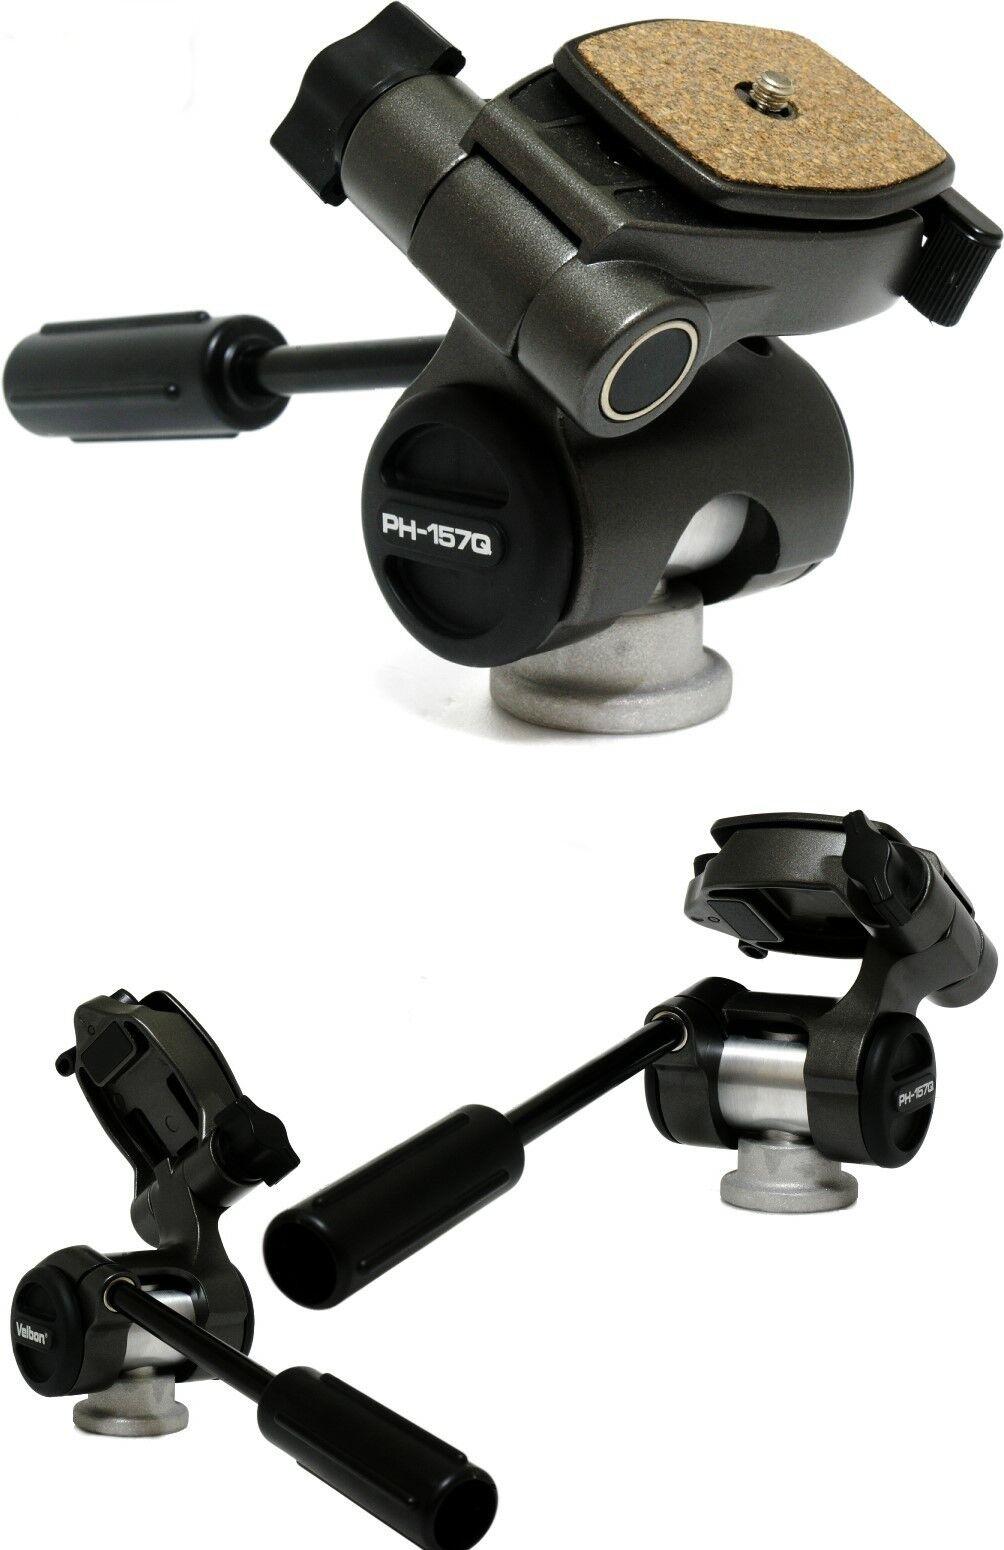 Velbon PH157-Q Pan Head 3-way with Quick Release Platform 1/4 Tripod fitting